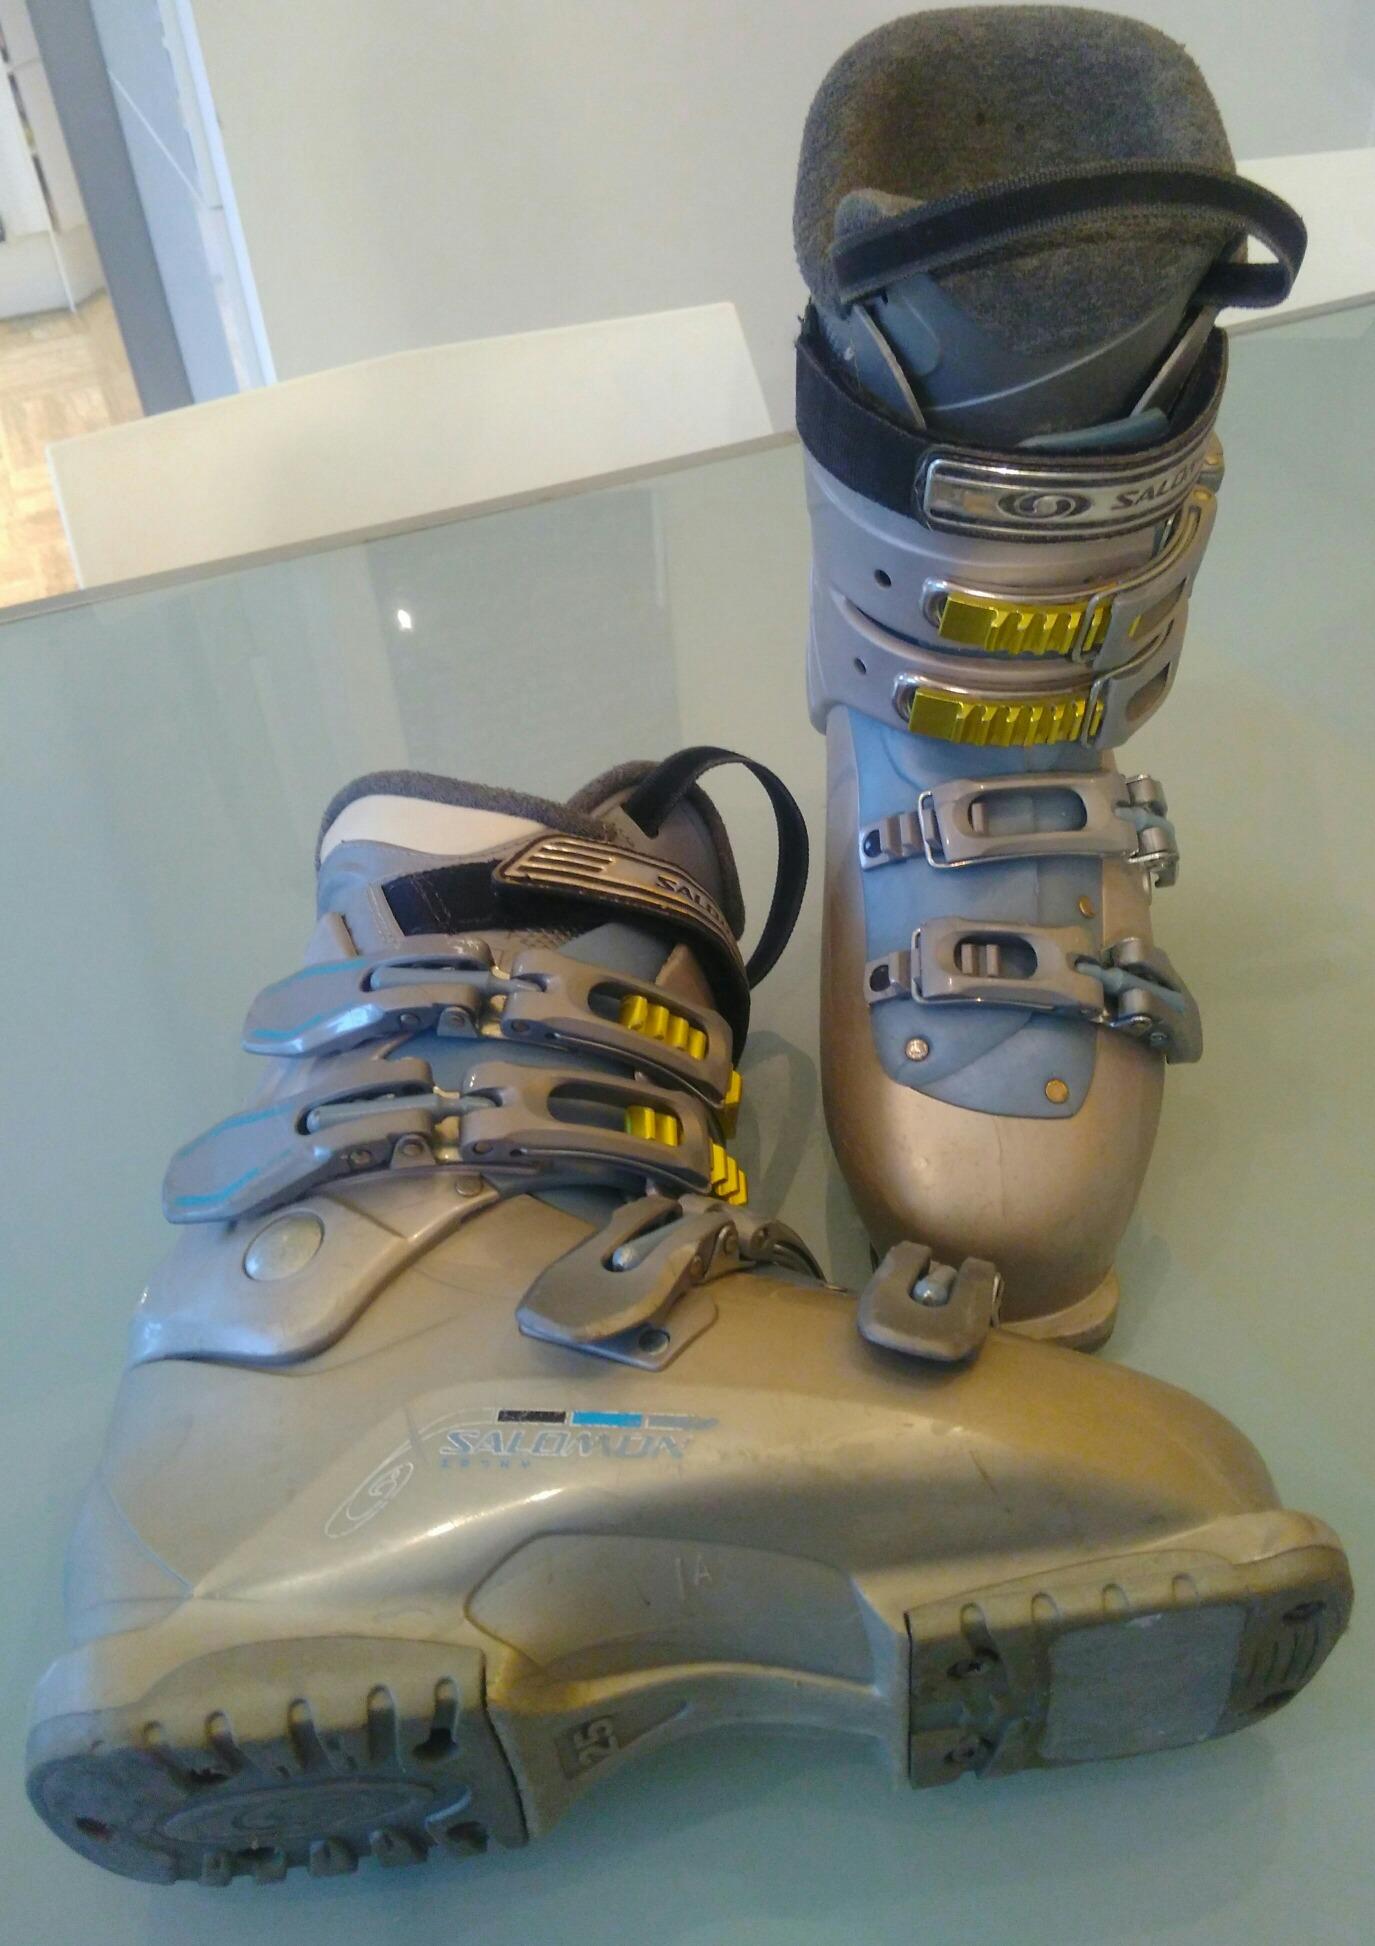 De Ski Champ Achetez À Vente Annonce Occasion Chaussures 56 Grand 5gawUqAvW 5ac7f5af554